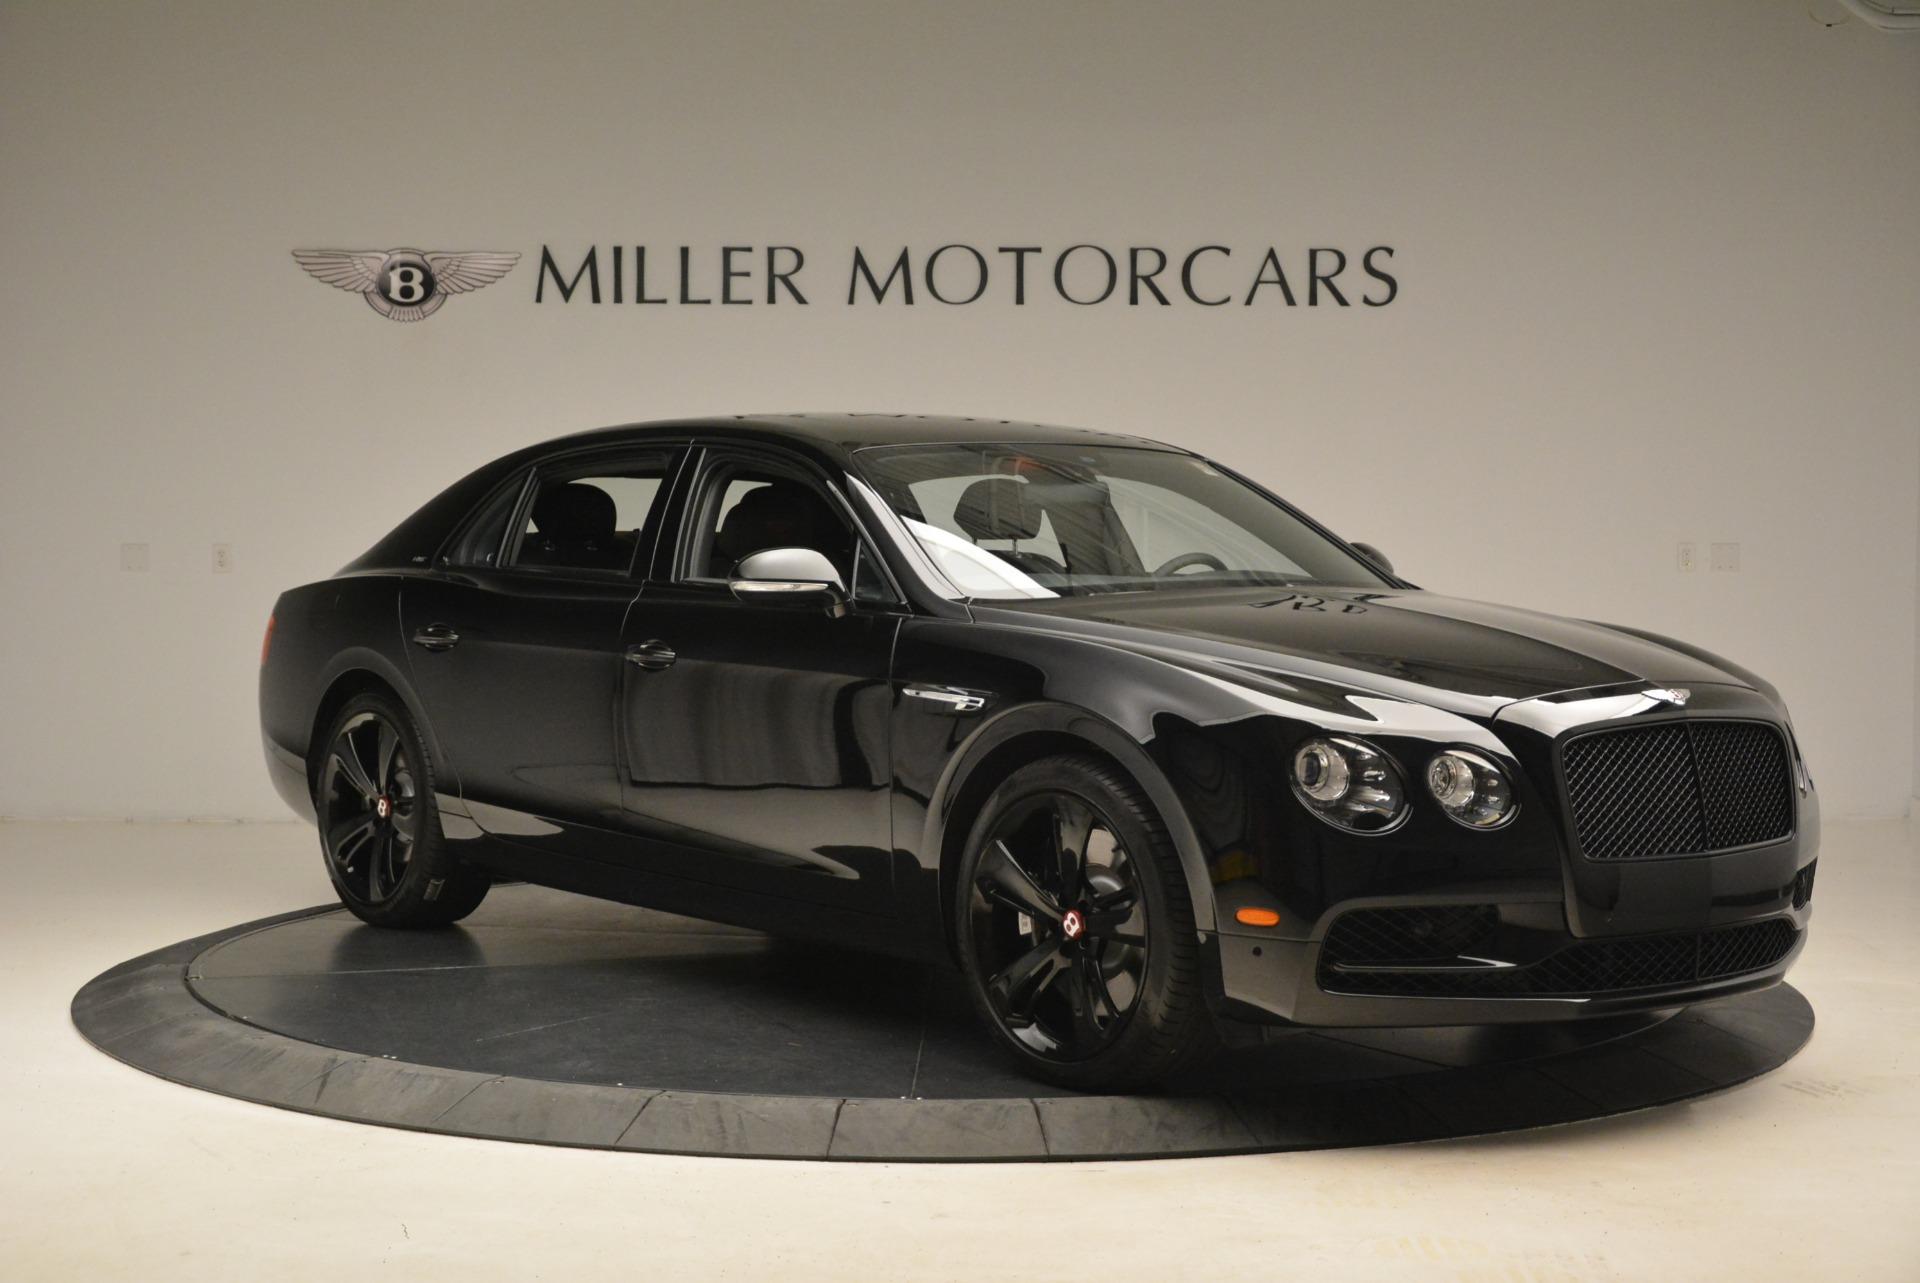 New 2018 Bentley Flying Spur V8 S Black Edition For Sale In Westport, CT 2073_p10